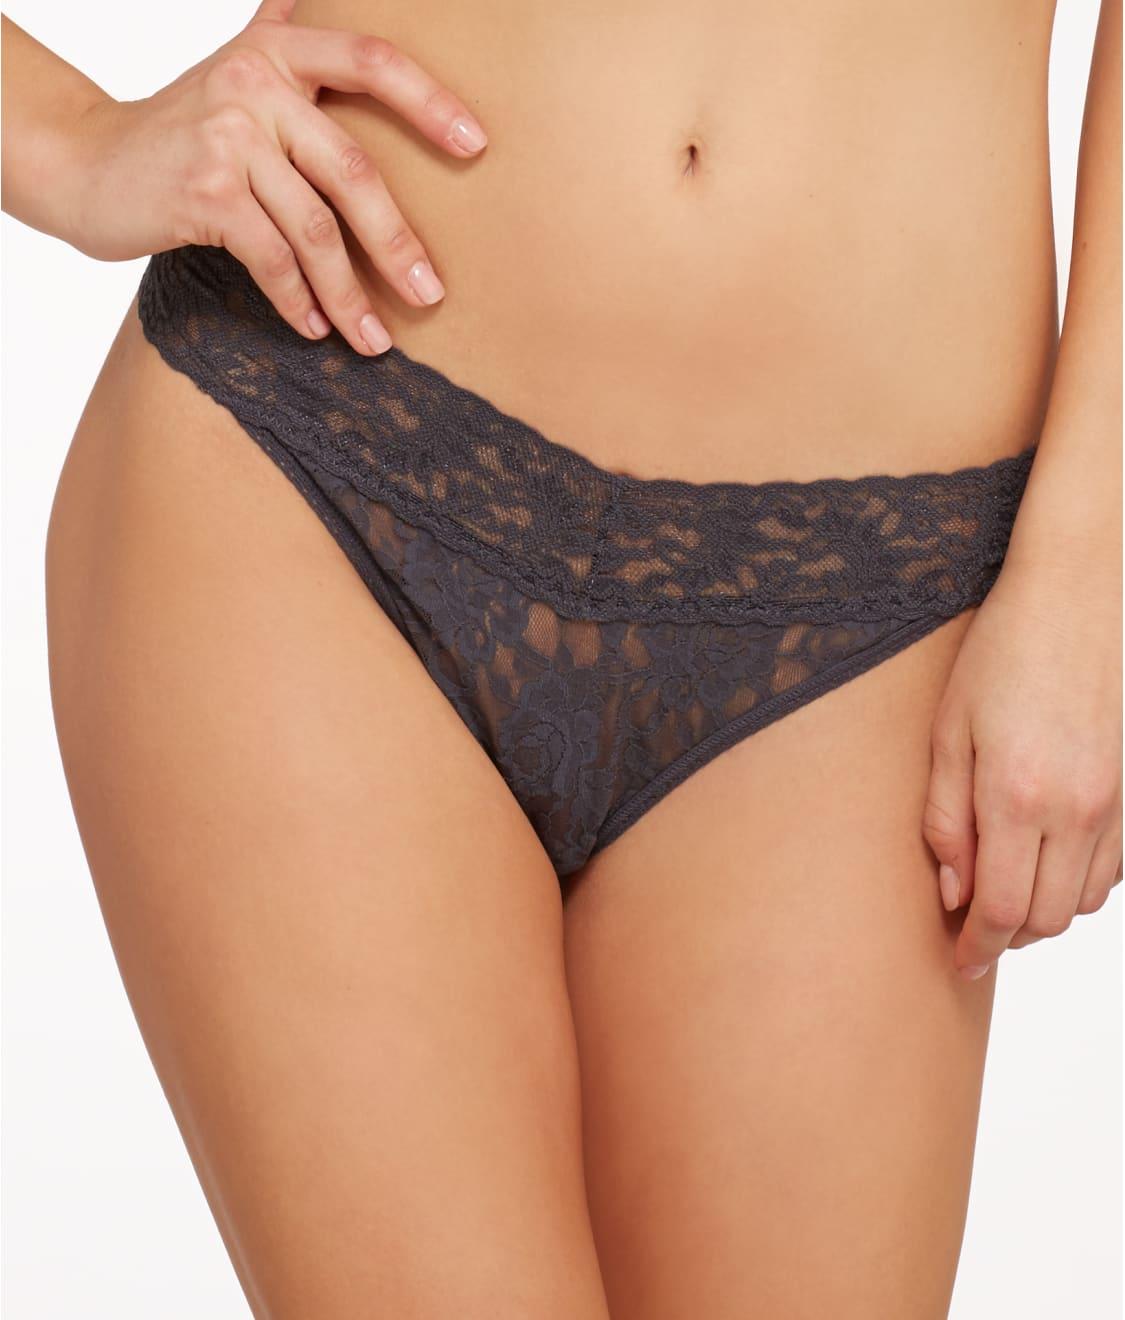 2651a38f1da8 Hanky Panky Plus Size Signature Lace Original Rise Thong | Bare ...